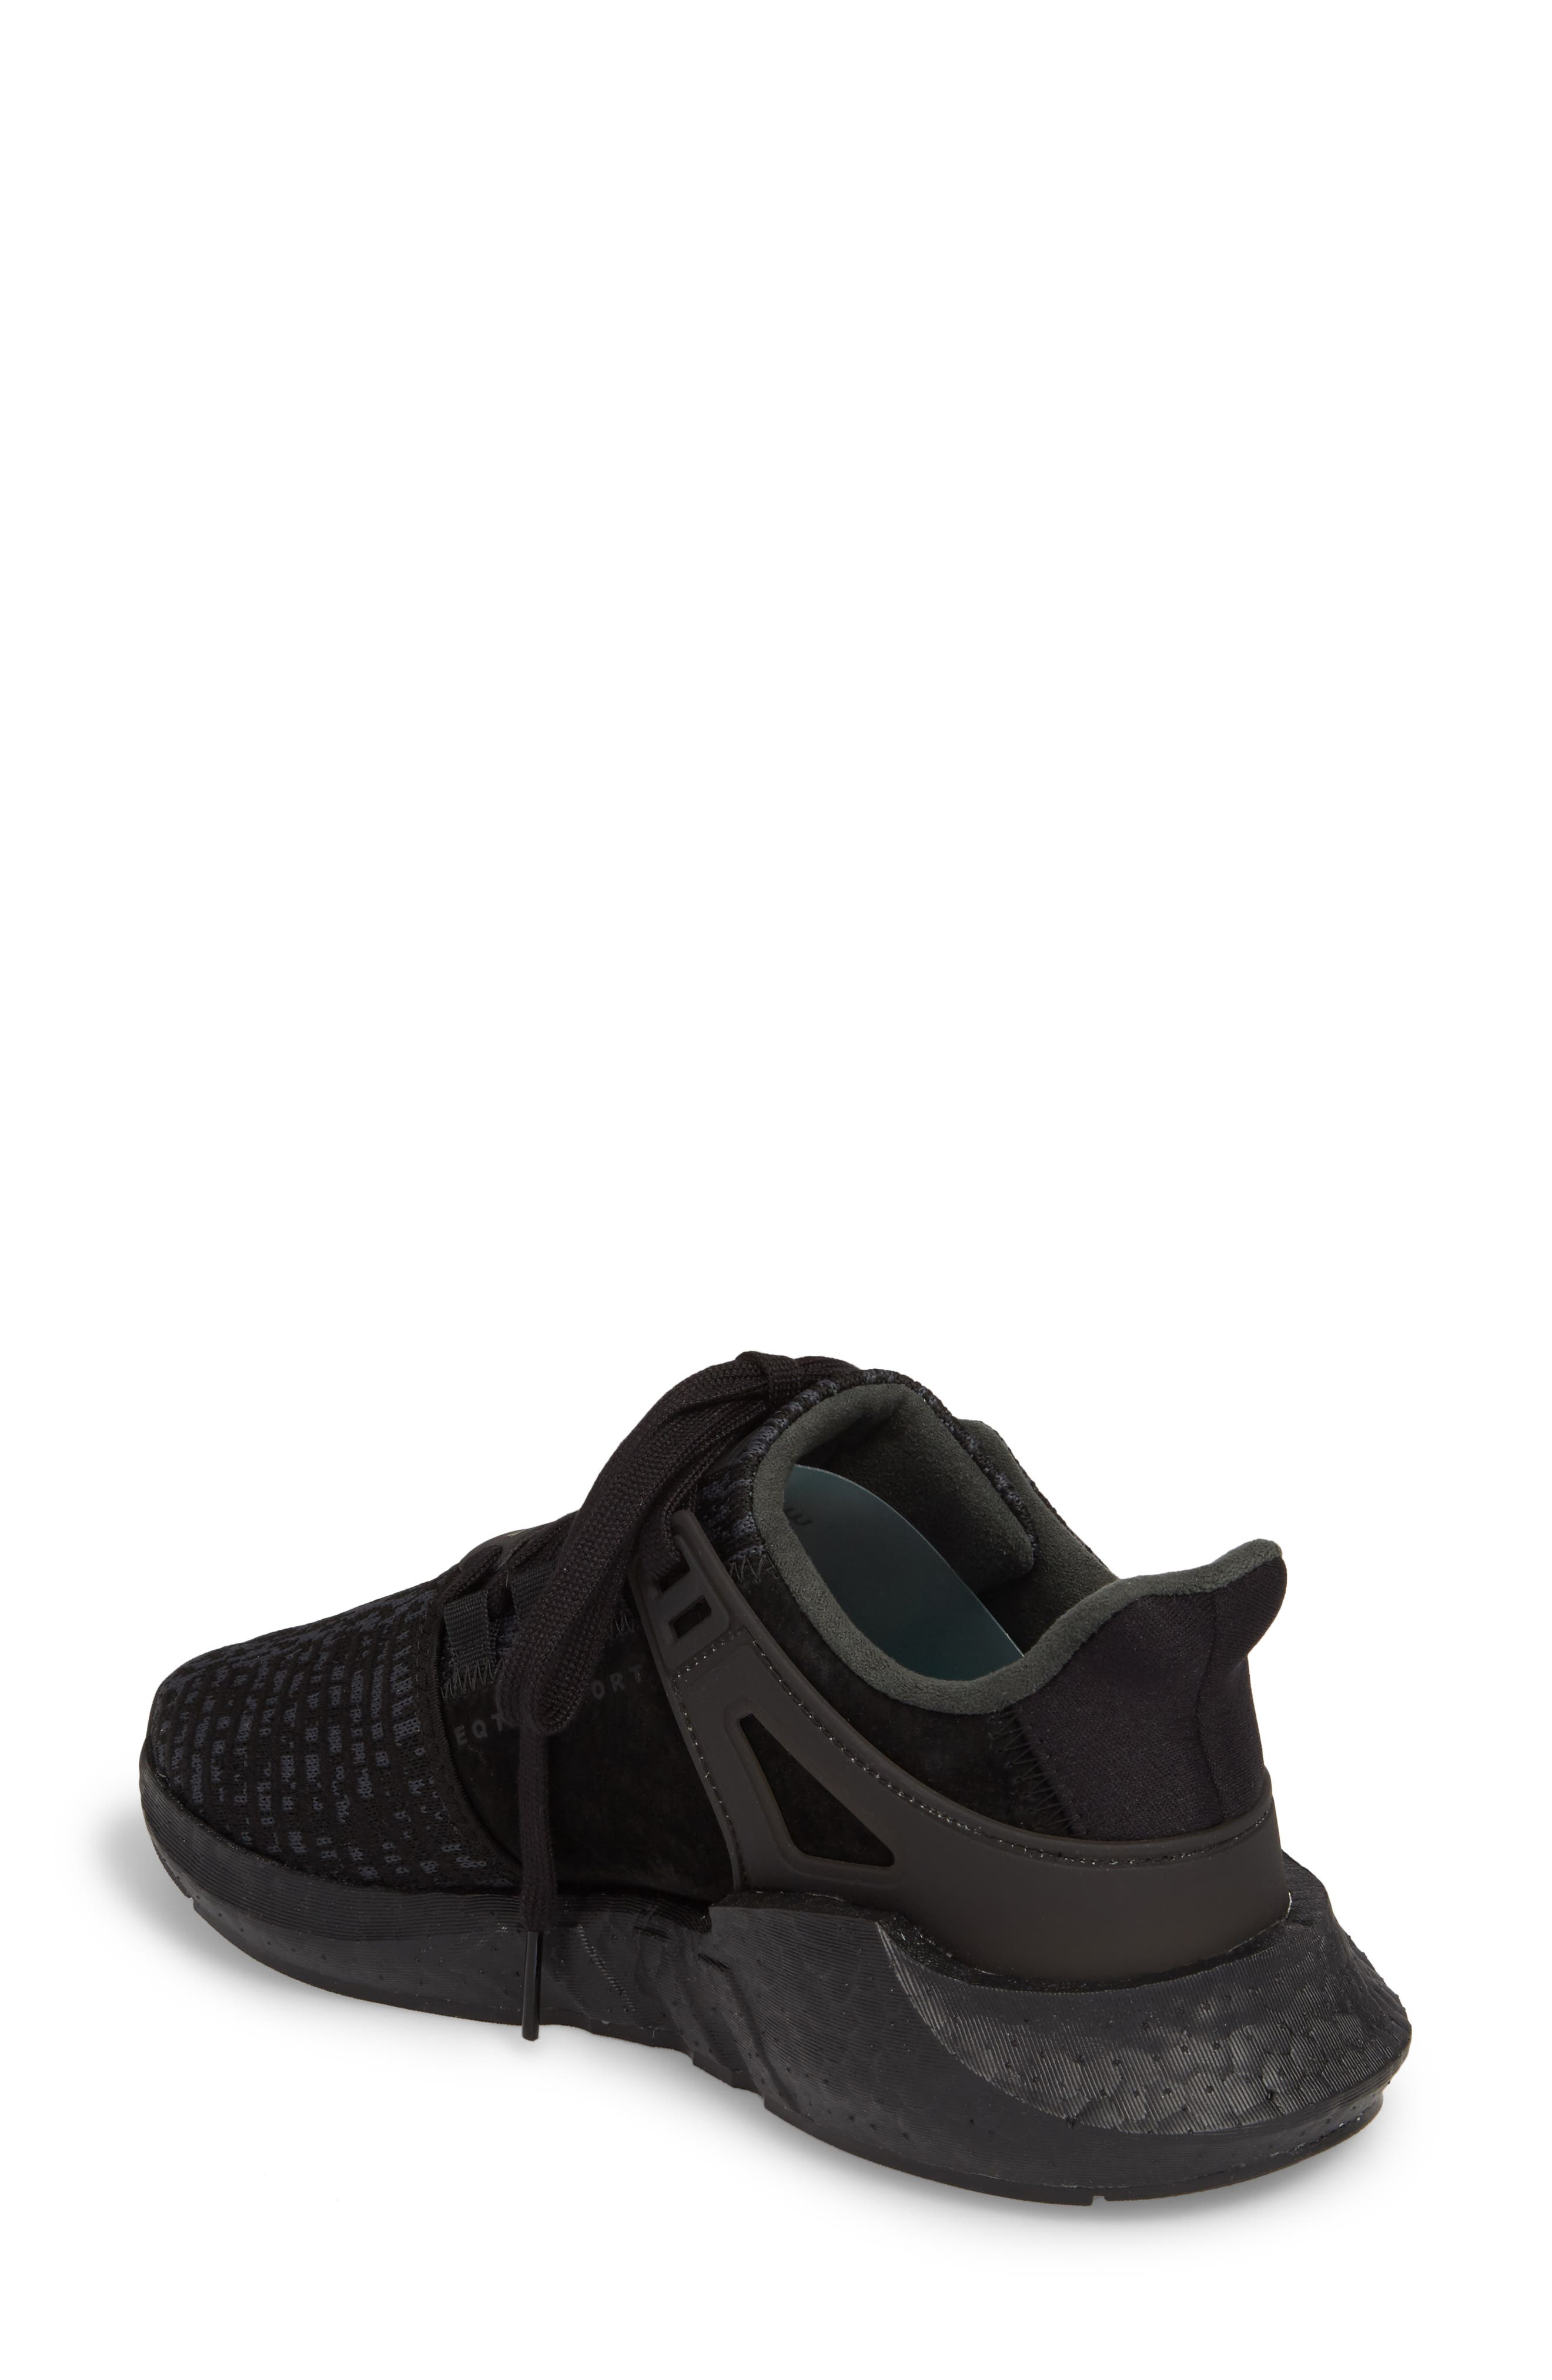 EQT Support 93/17 Sneaker,                             Alternate thumbnail 9, color,